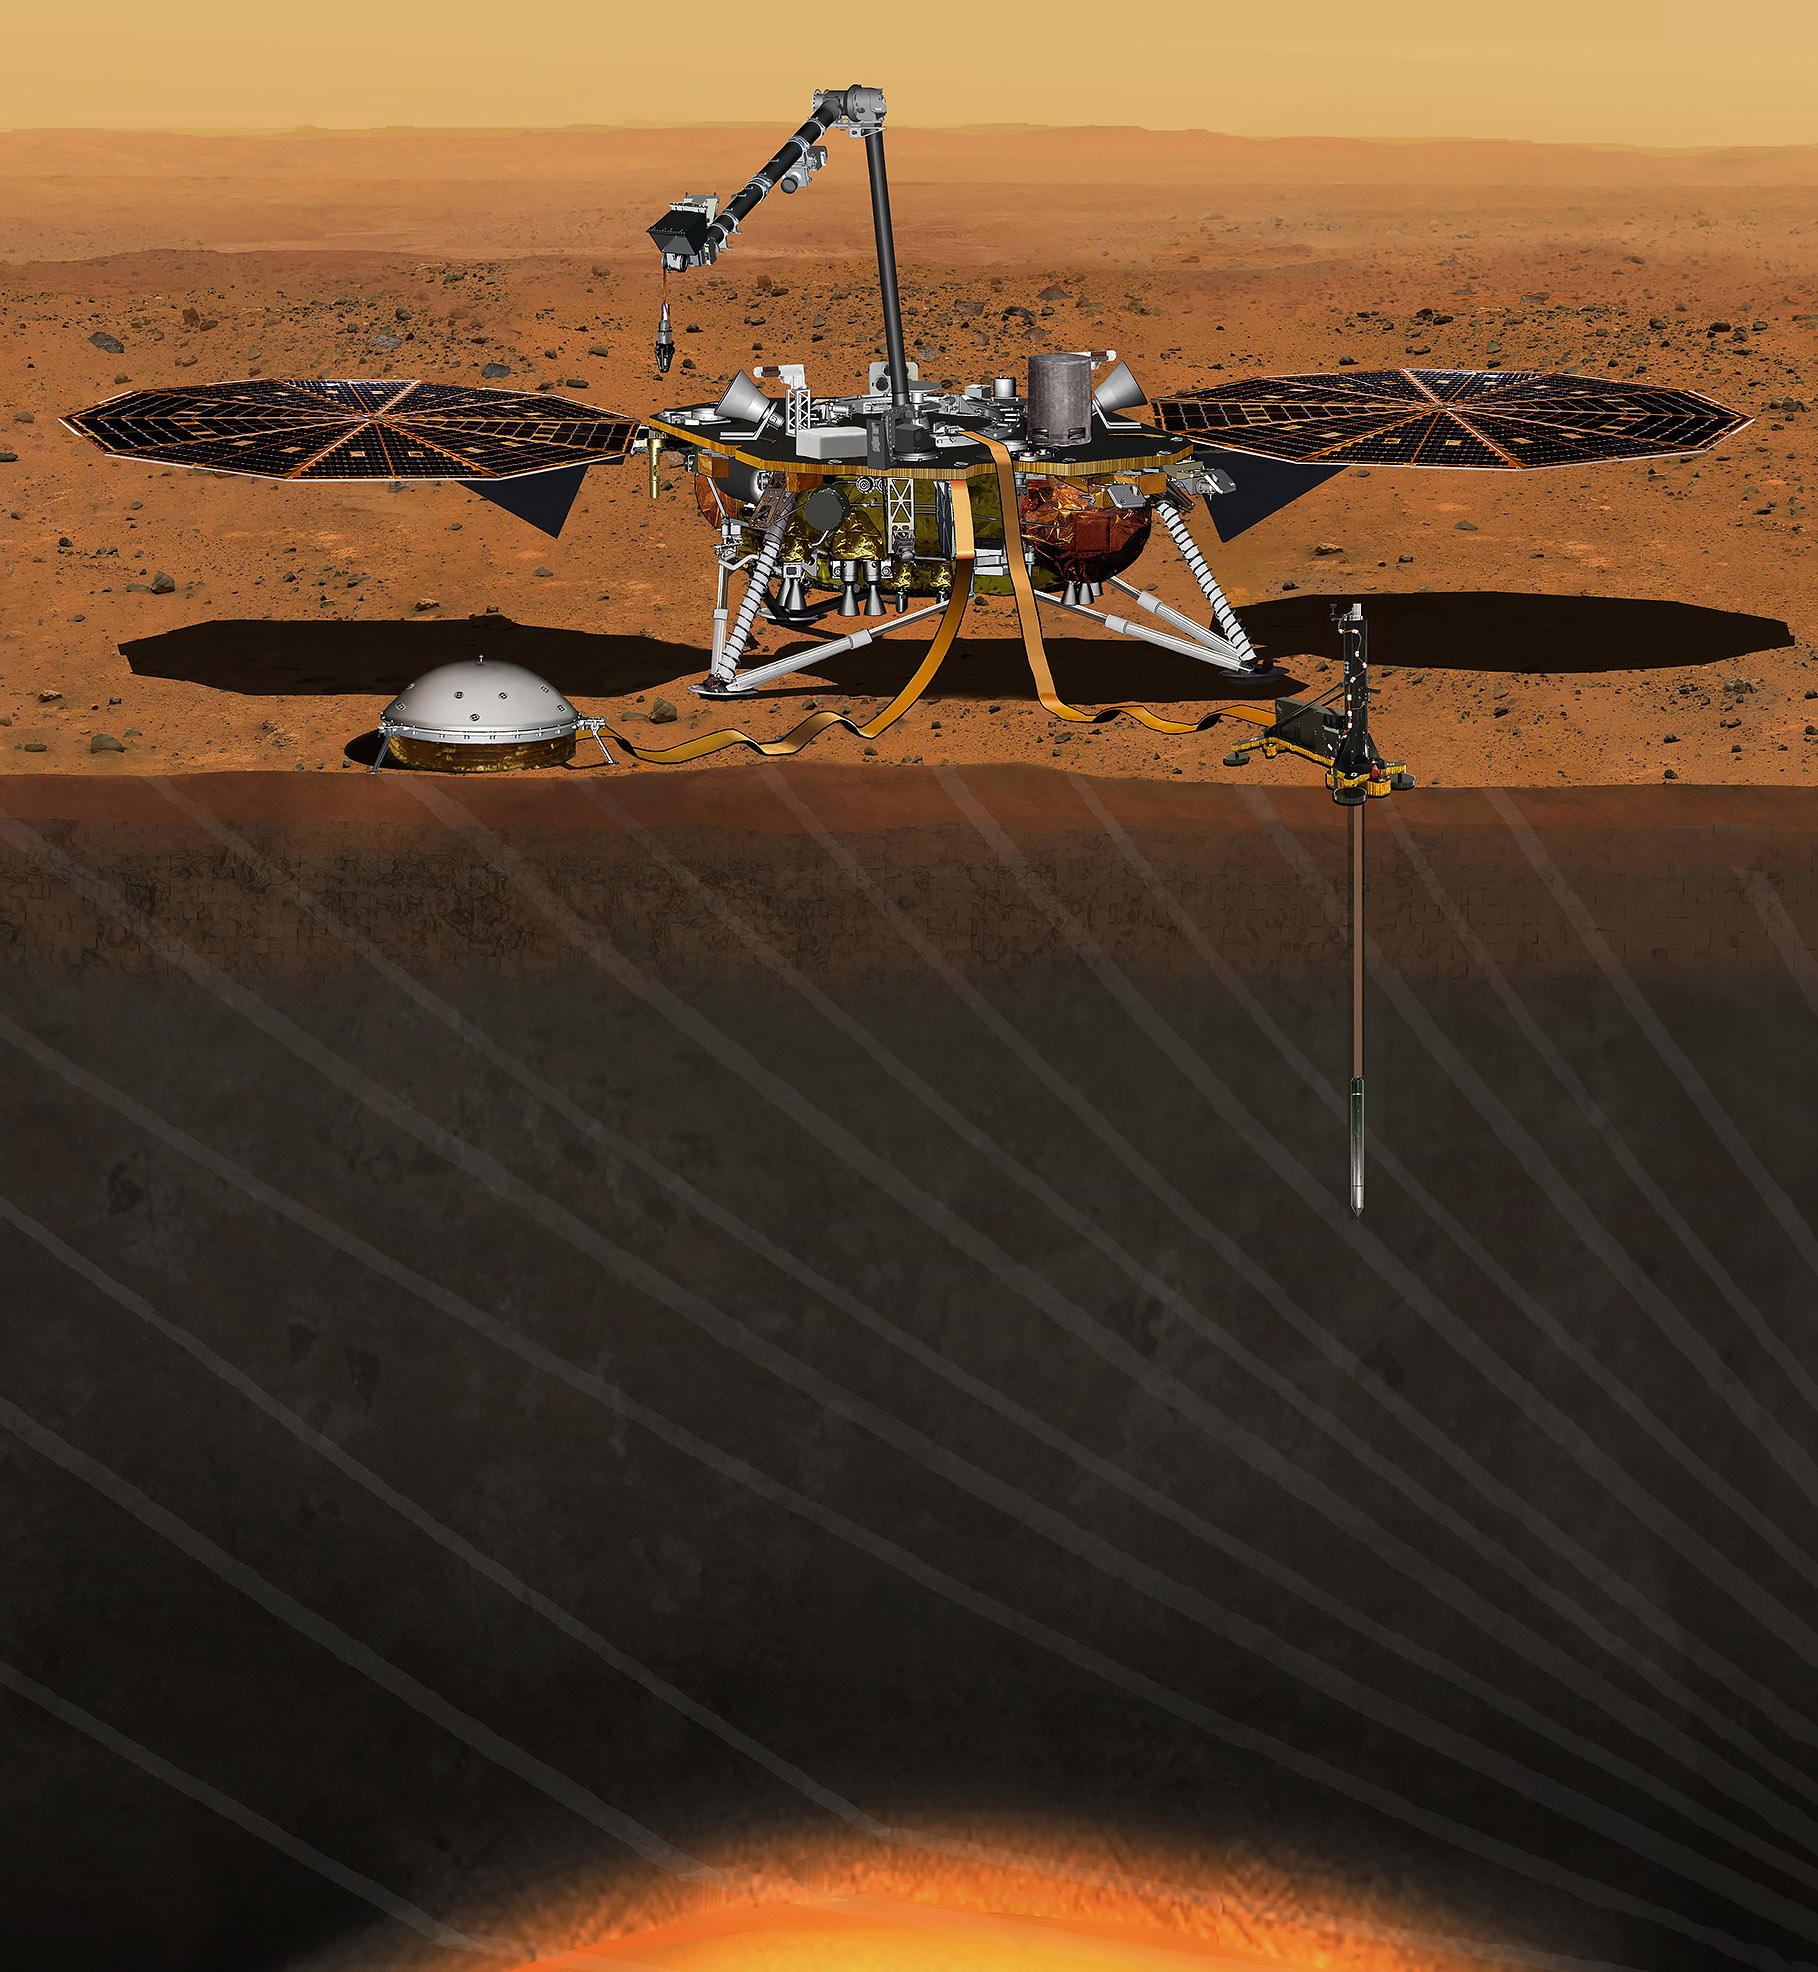 mars mission nasa - HD1024×1105